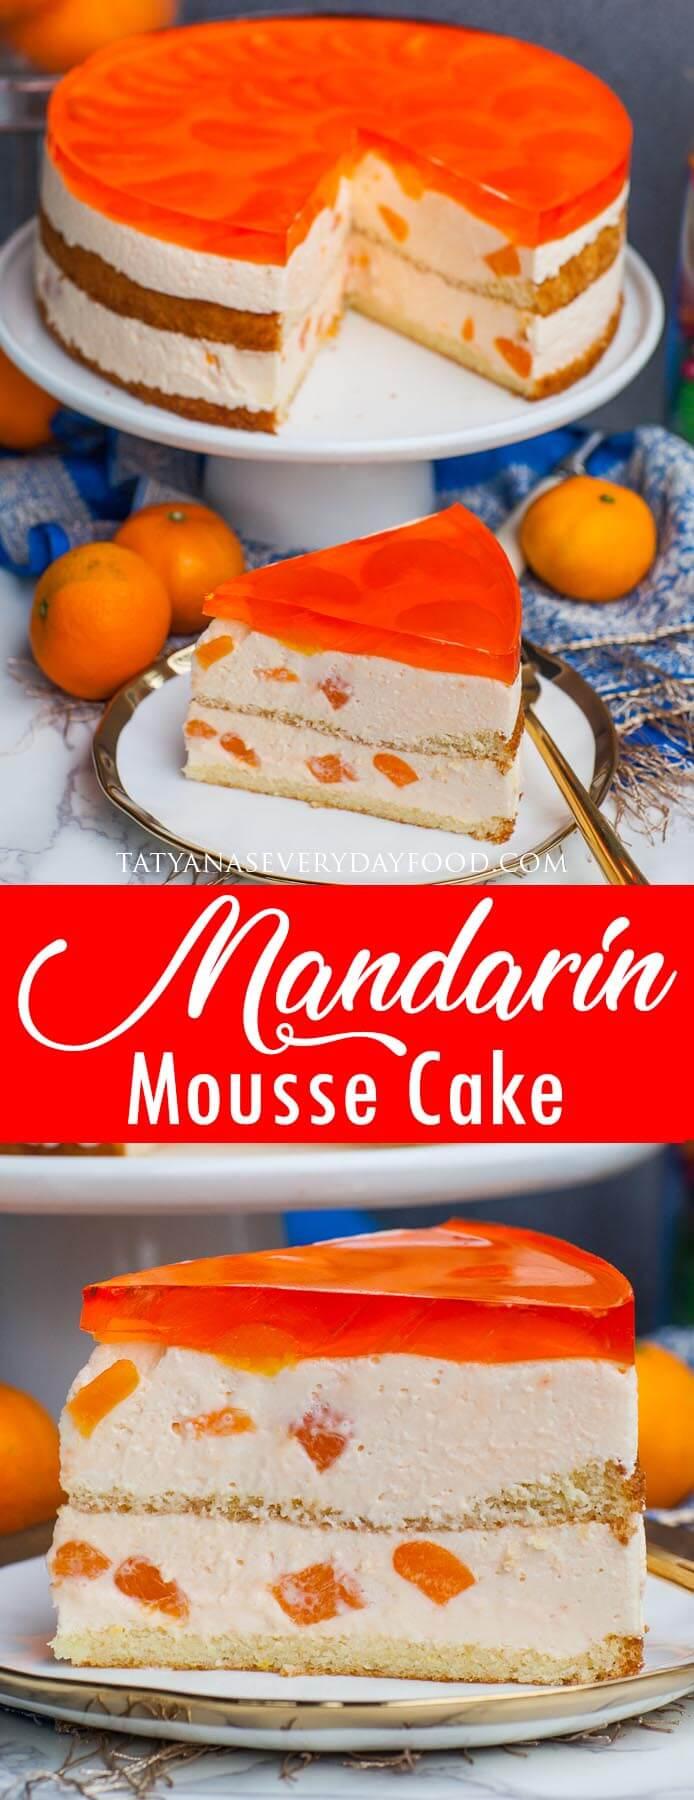 Mandarin Mousse Cake video recipe